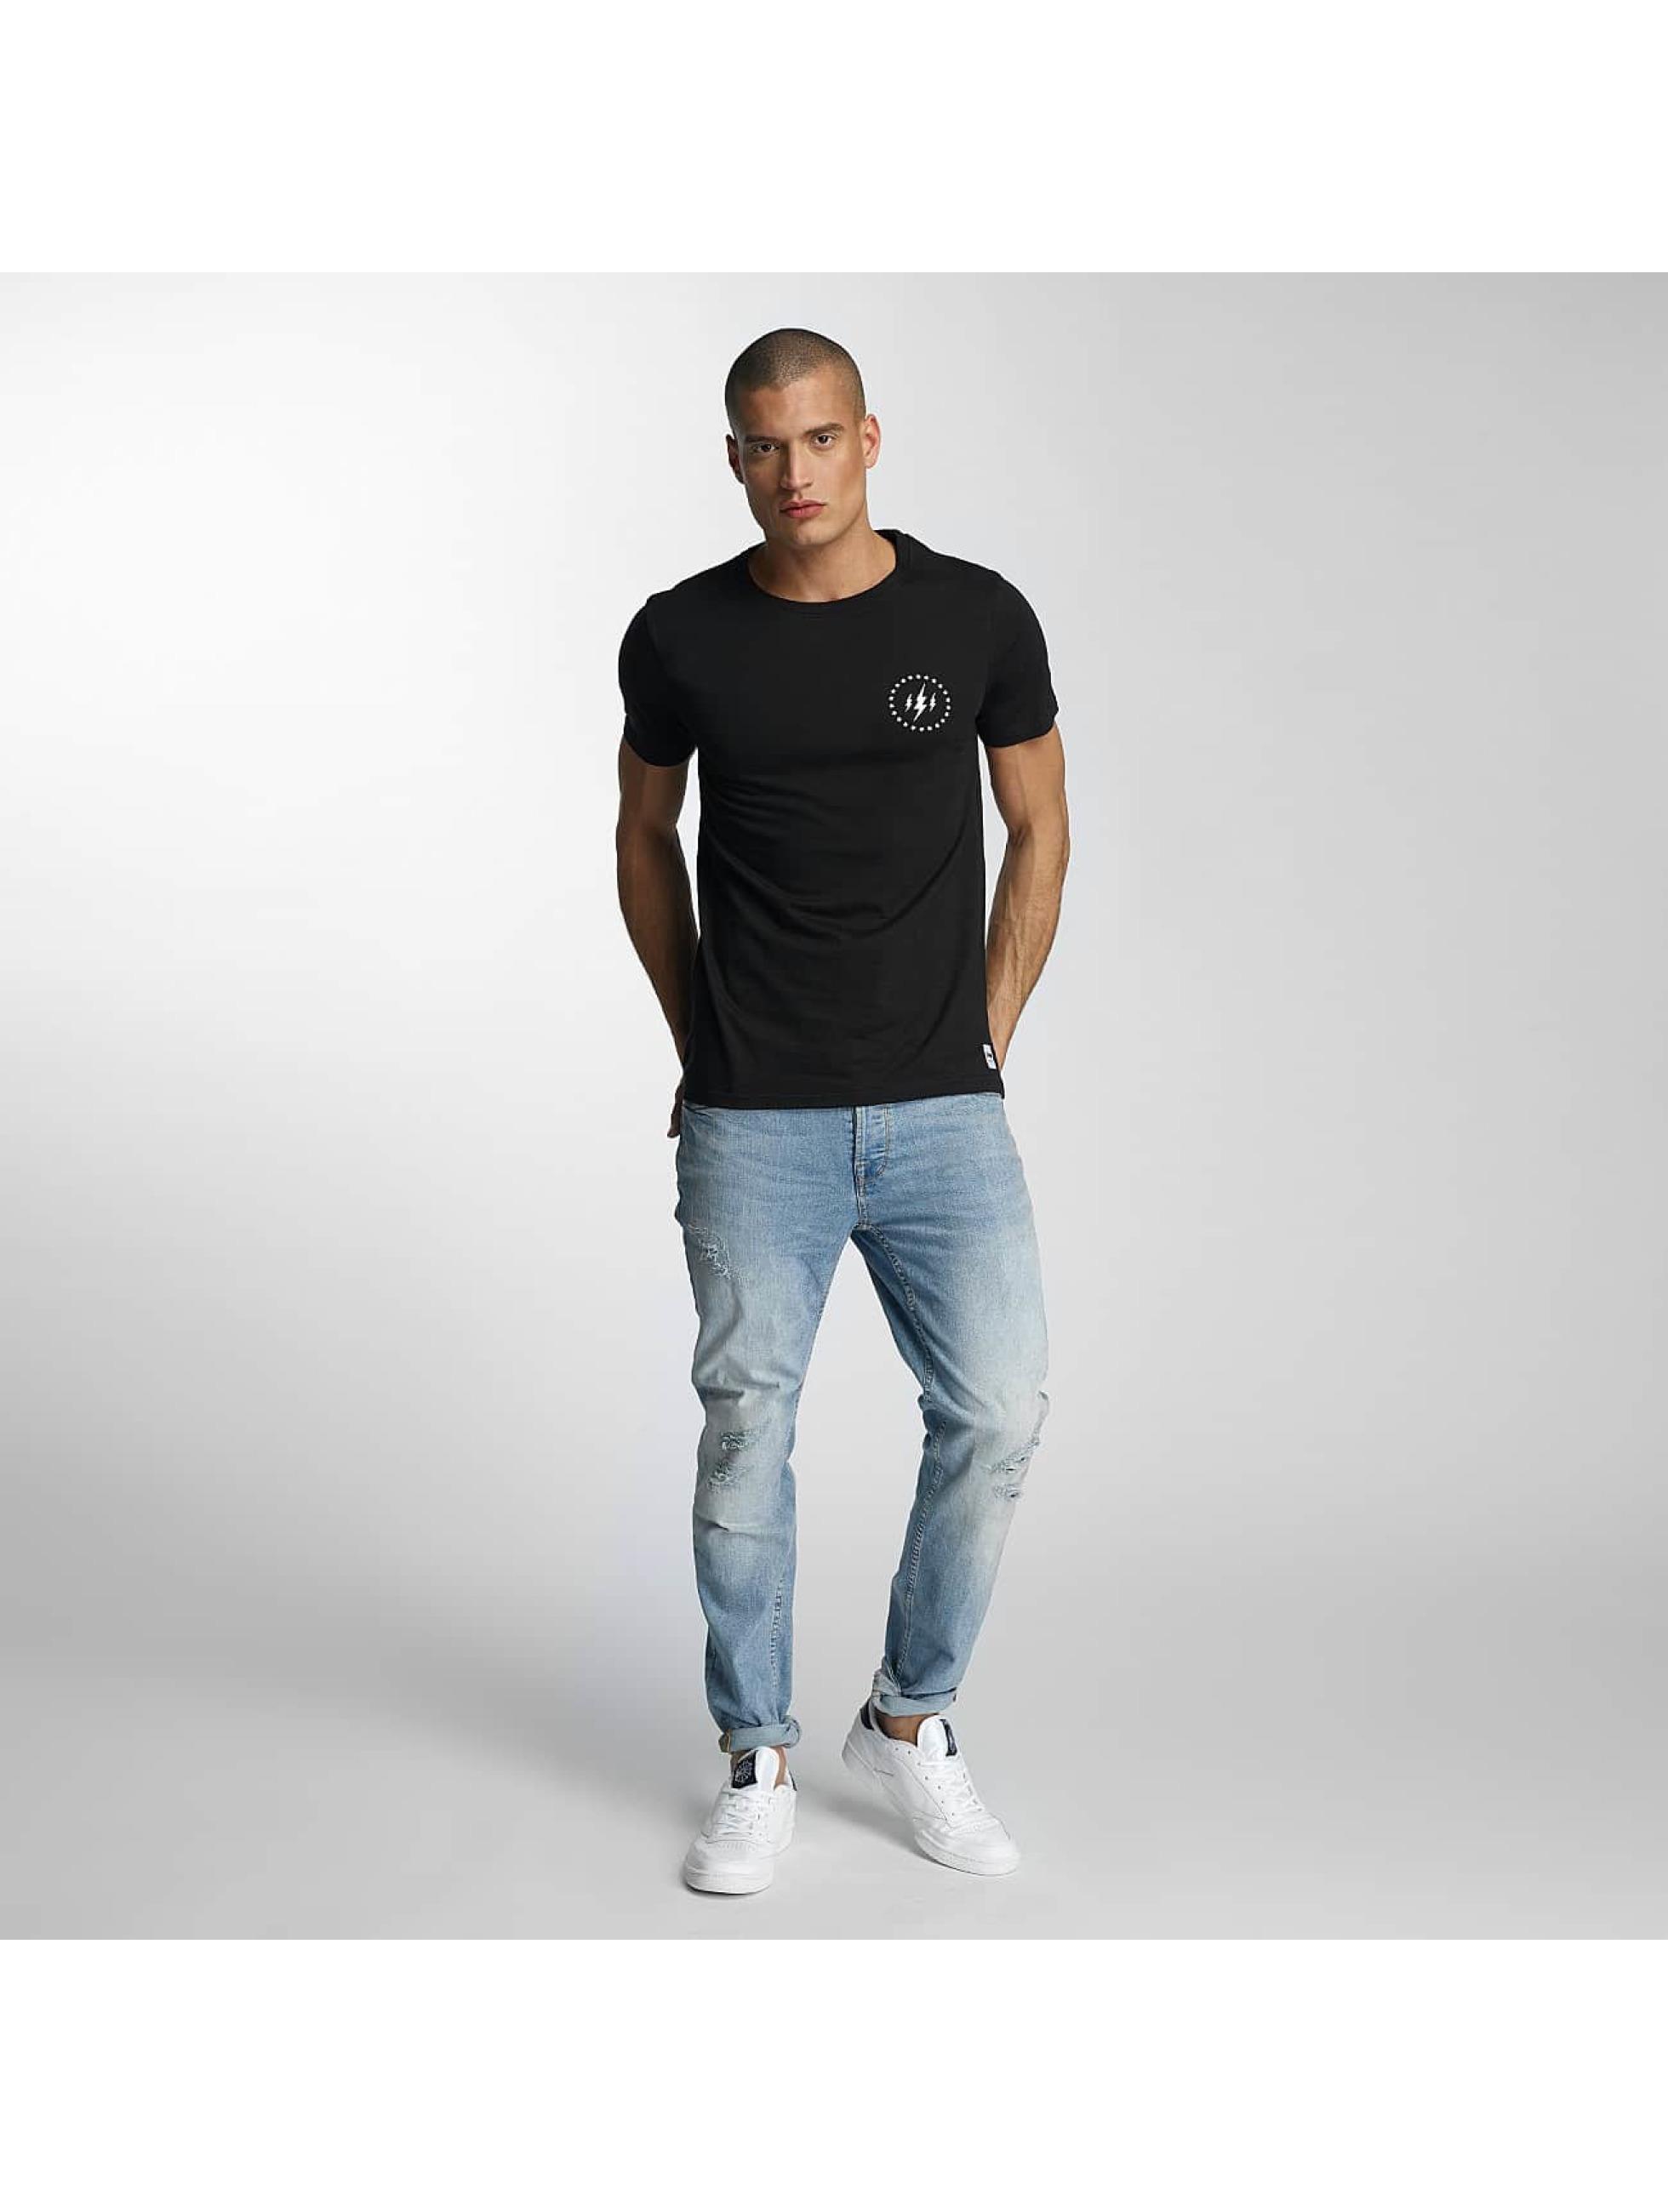 TrueSpin T-Shirt 4 schwarz